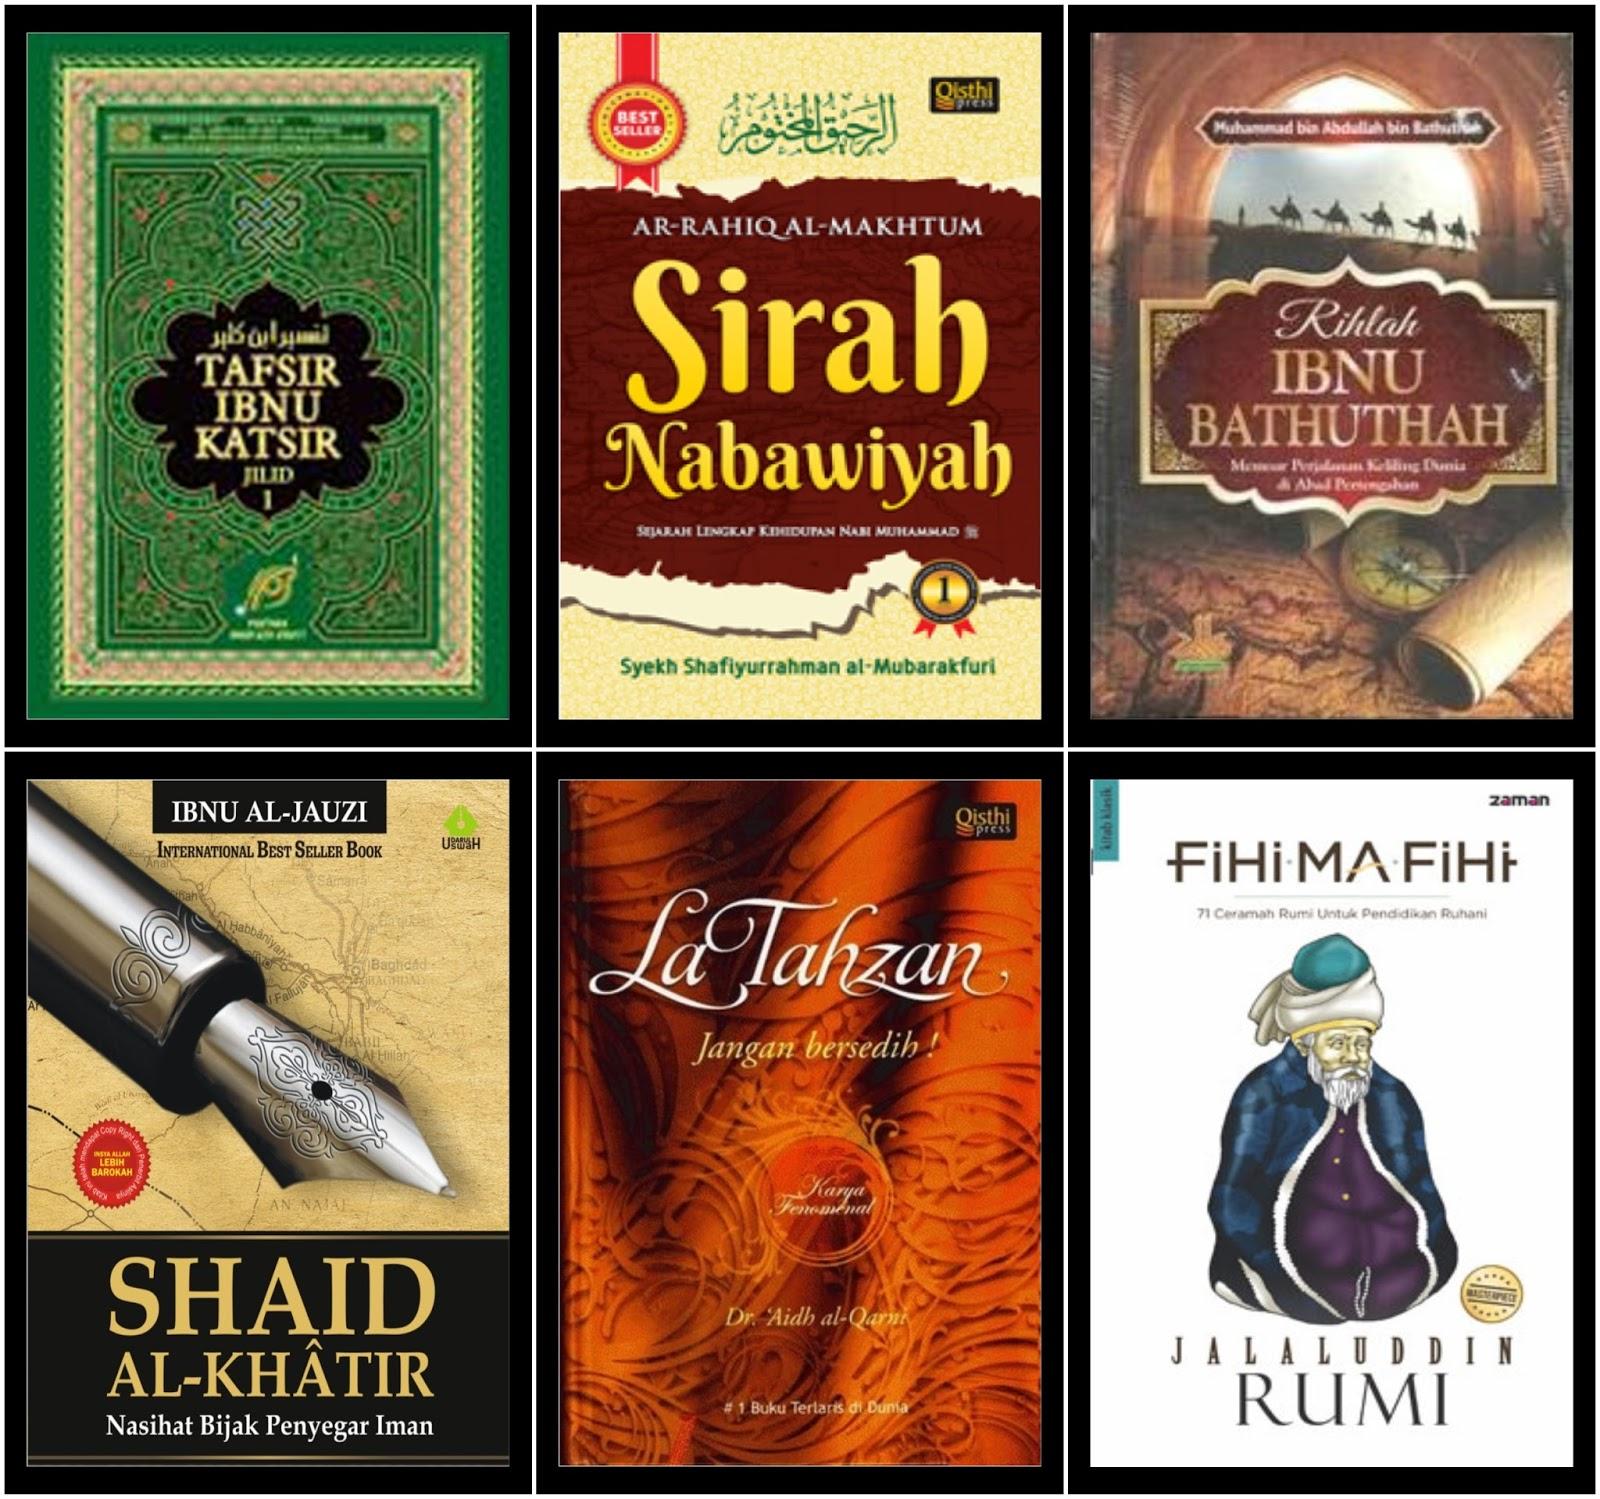 Daftar Baca Buku Nonfiksi Tahun 2017 ~ Catatan Kecil